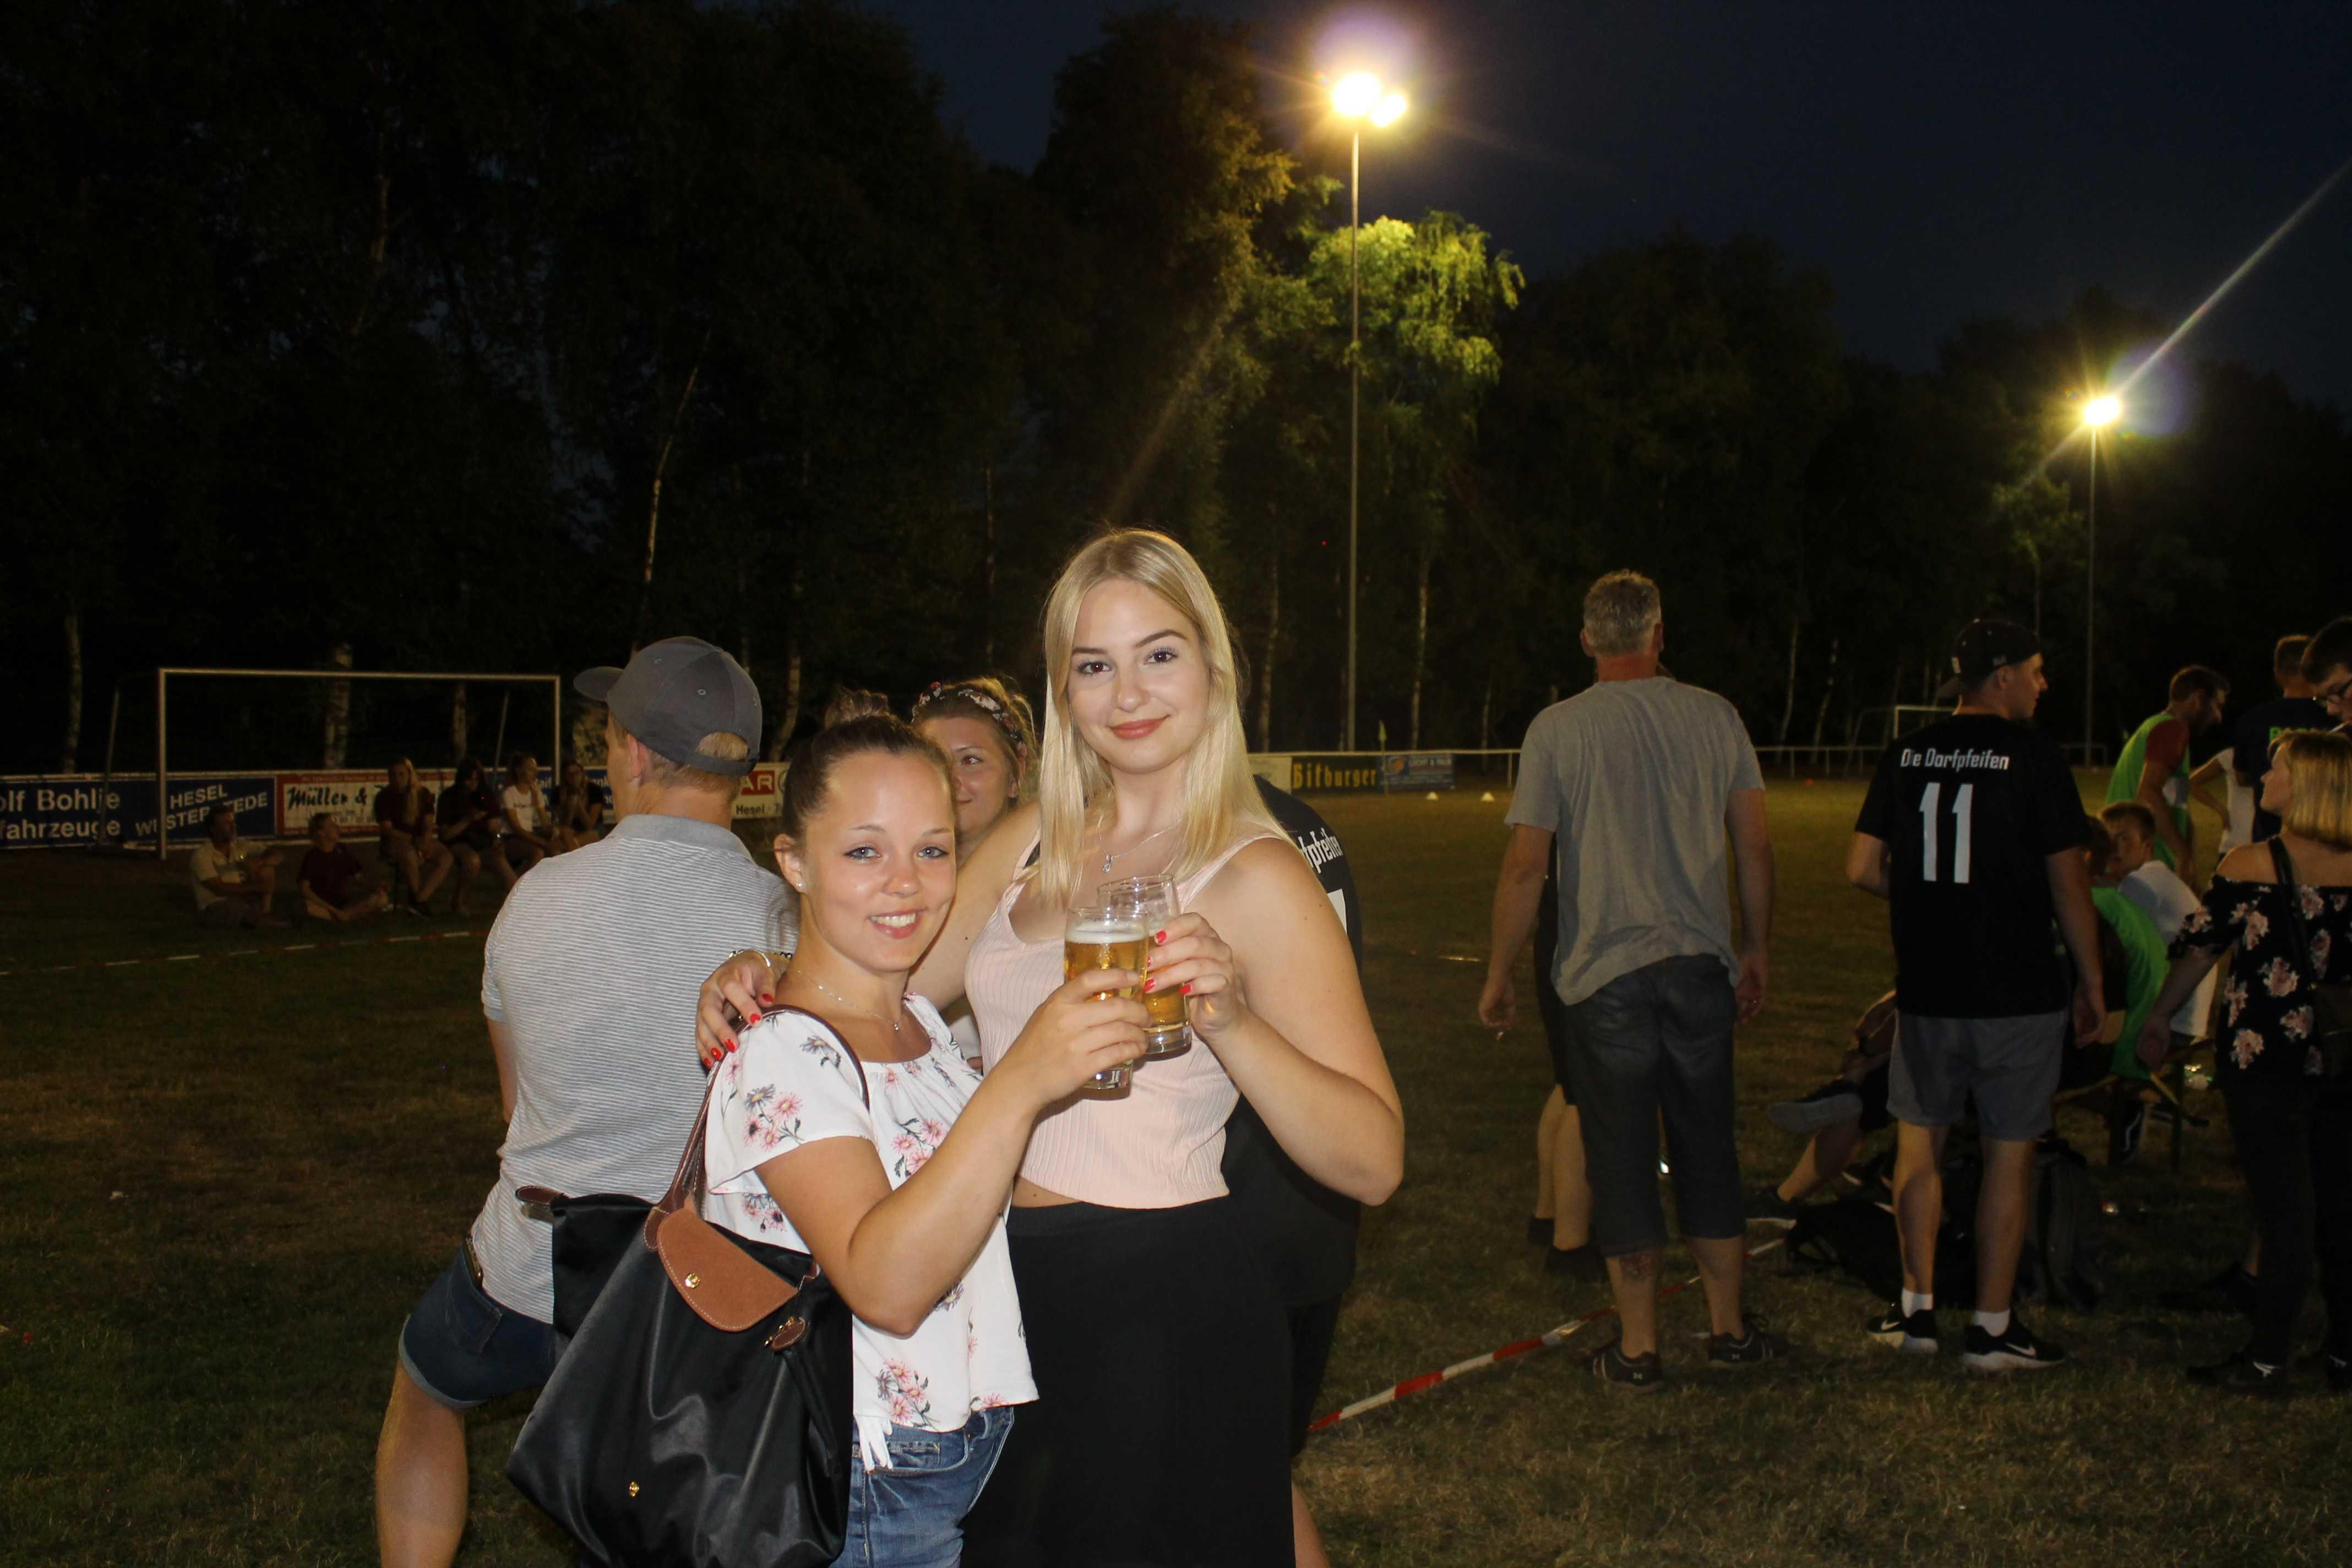 2018-07-27 Sportwoche - Flunkyball Turnier (66)